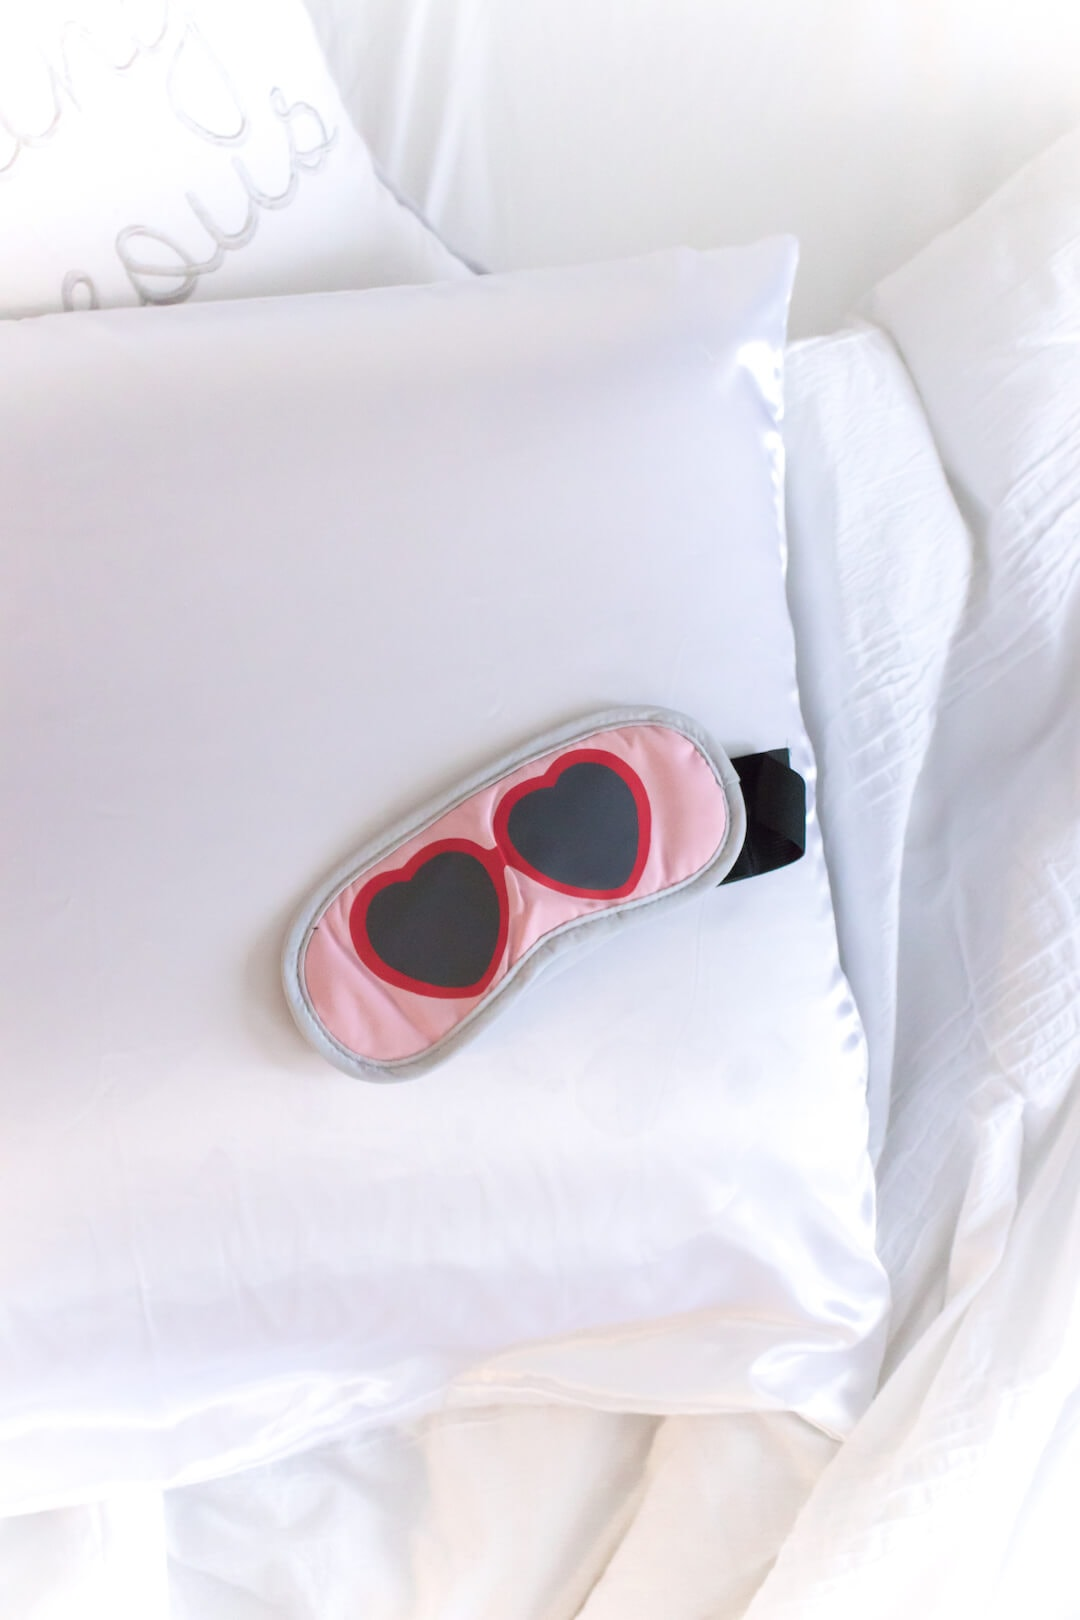 Silk Pillowcase Review